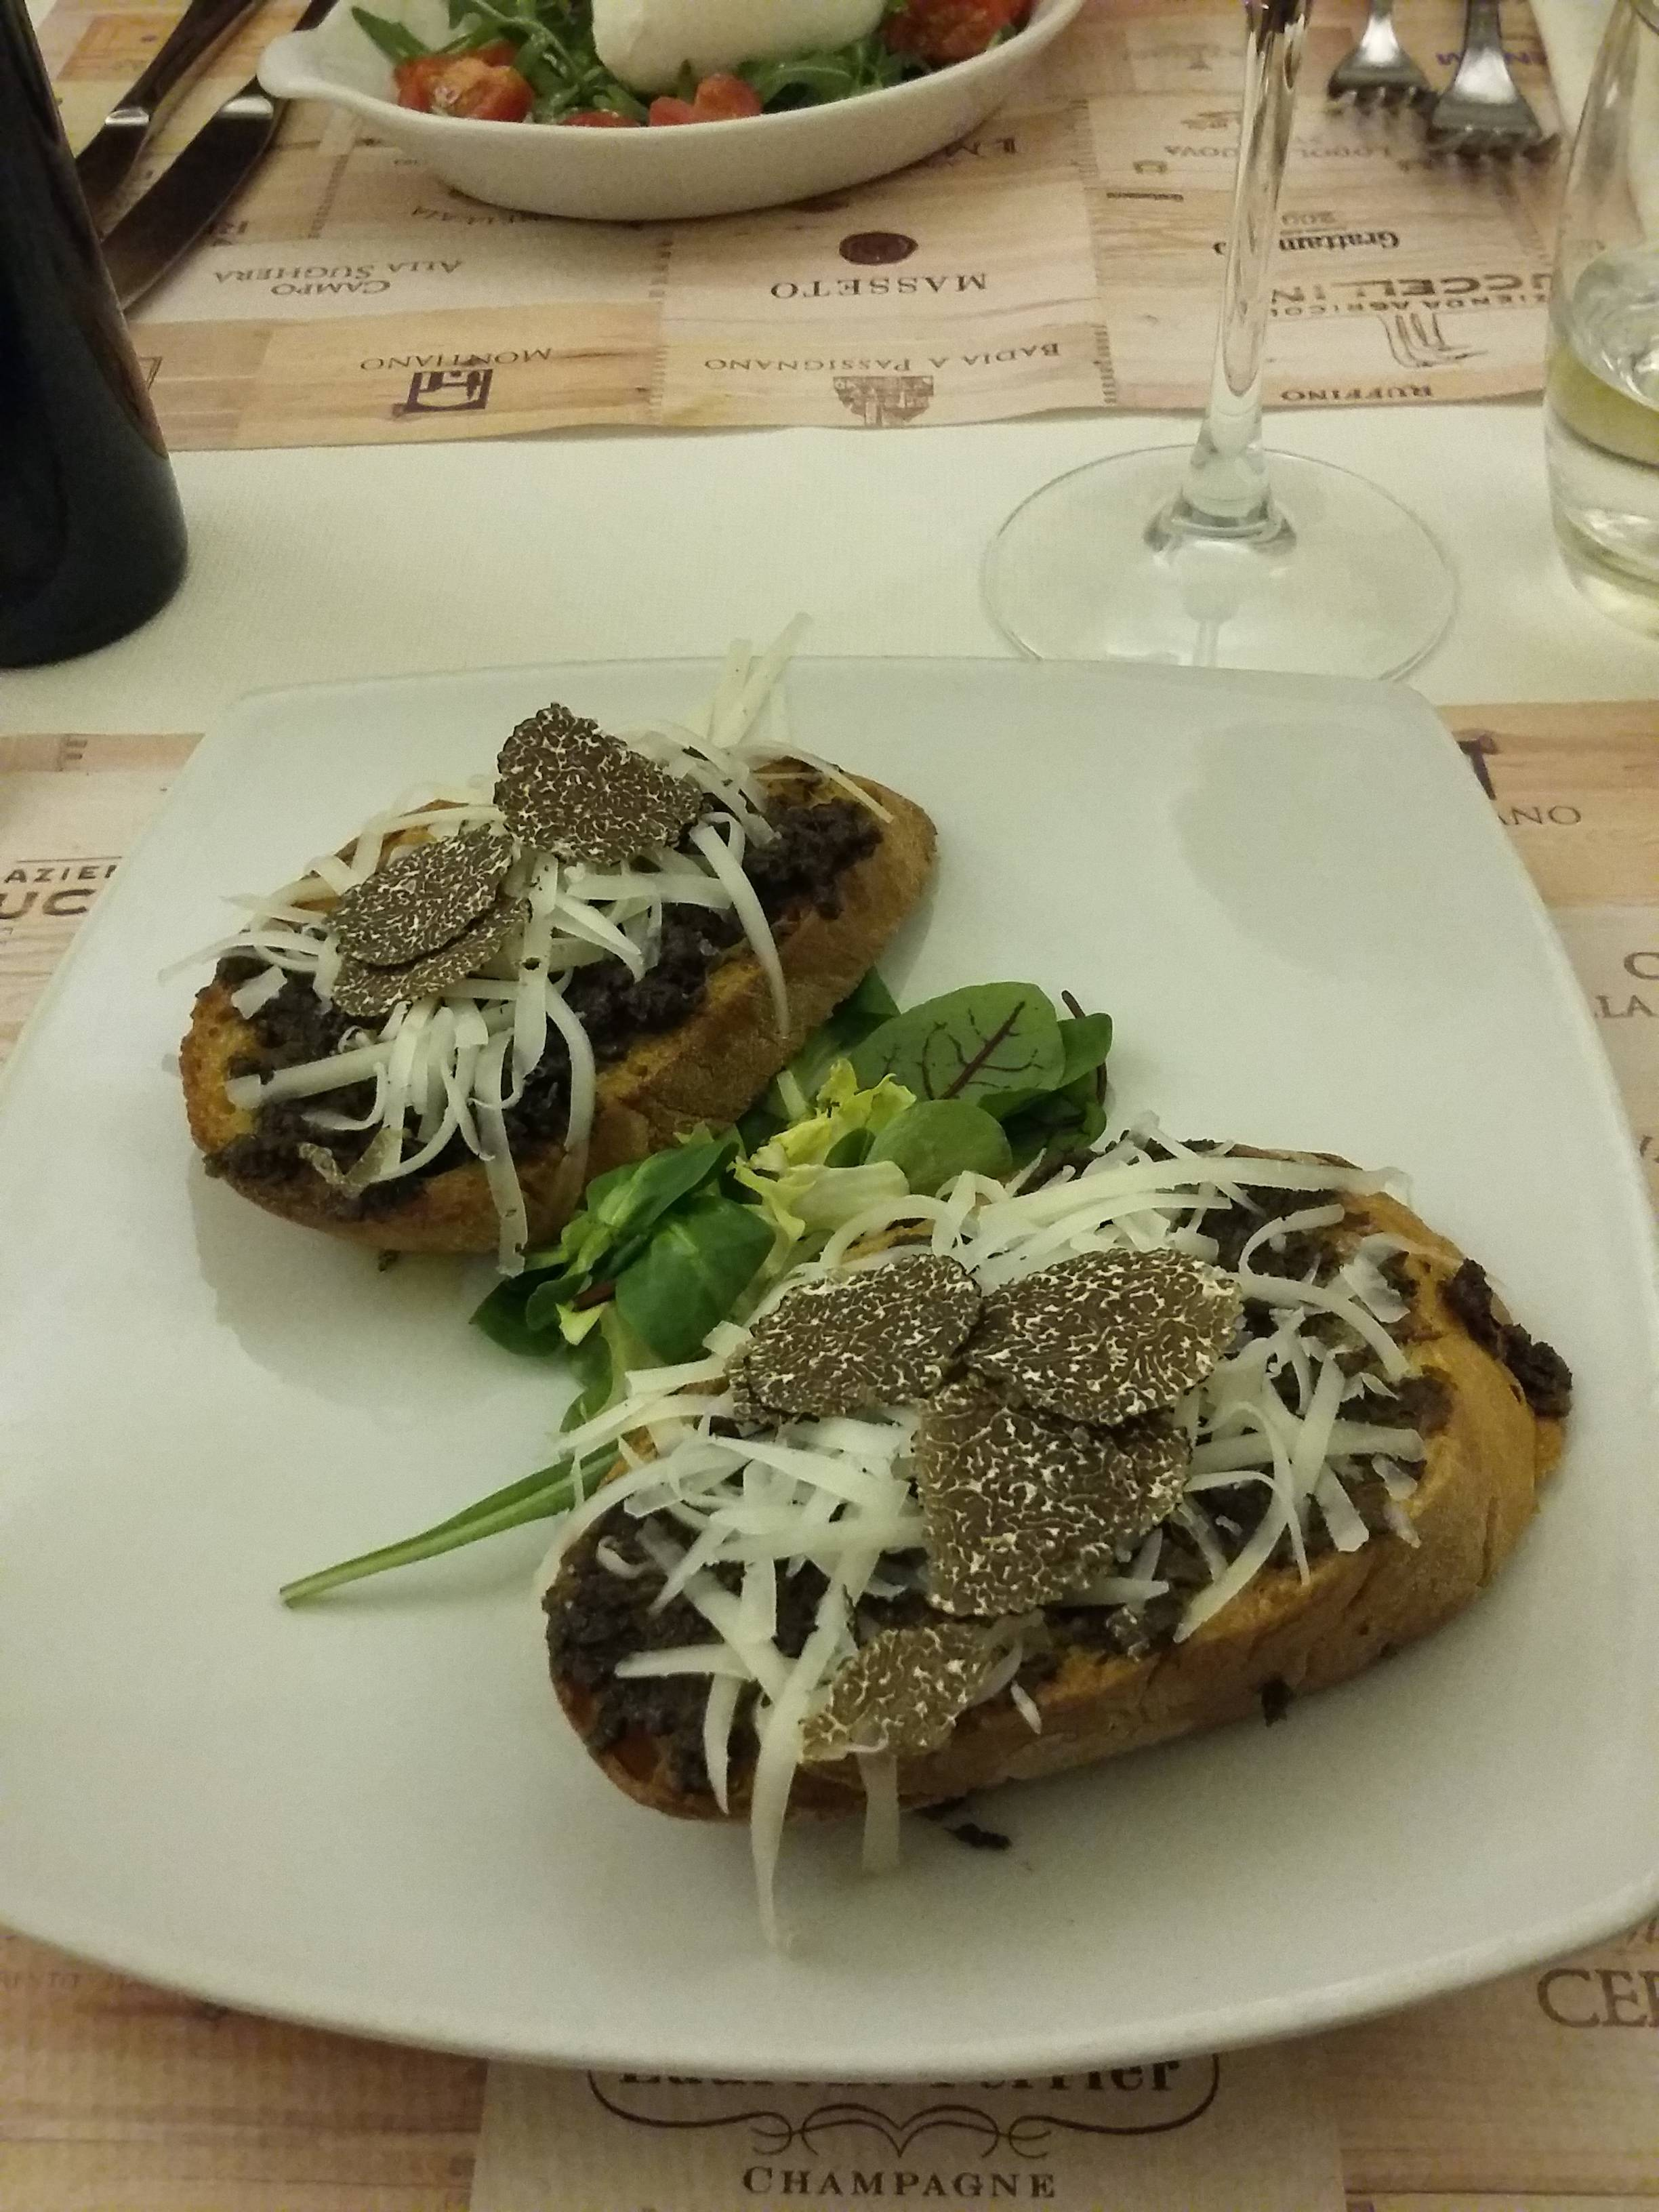 Photo 1: Osteria Barberini, la truffe sous toutes ses formes!